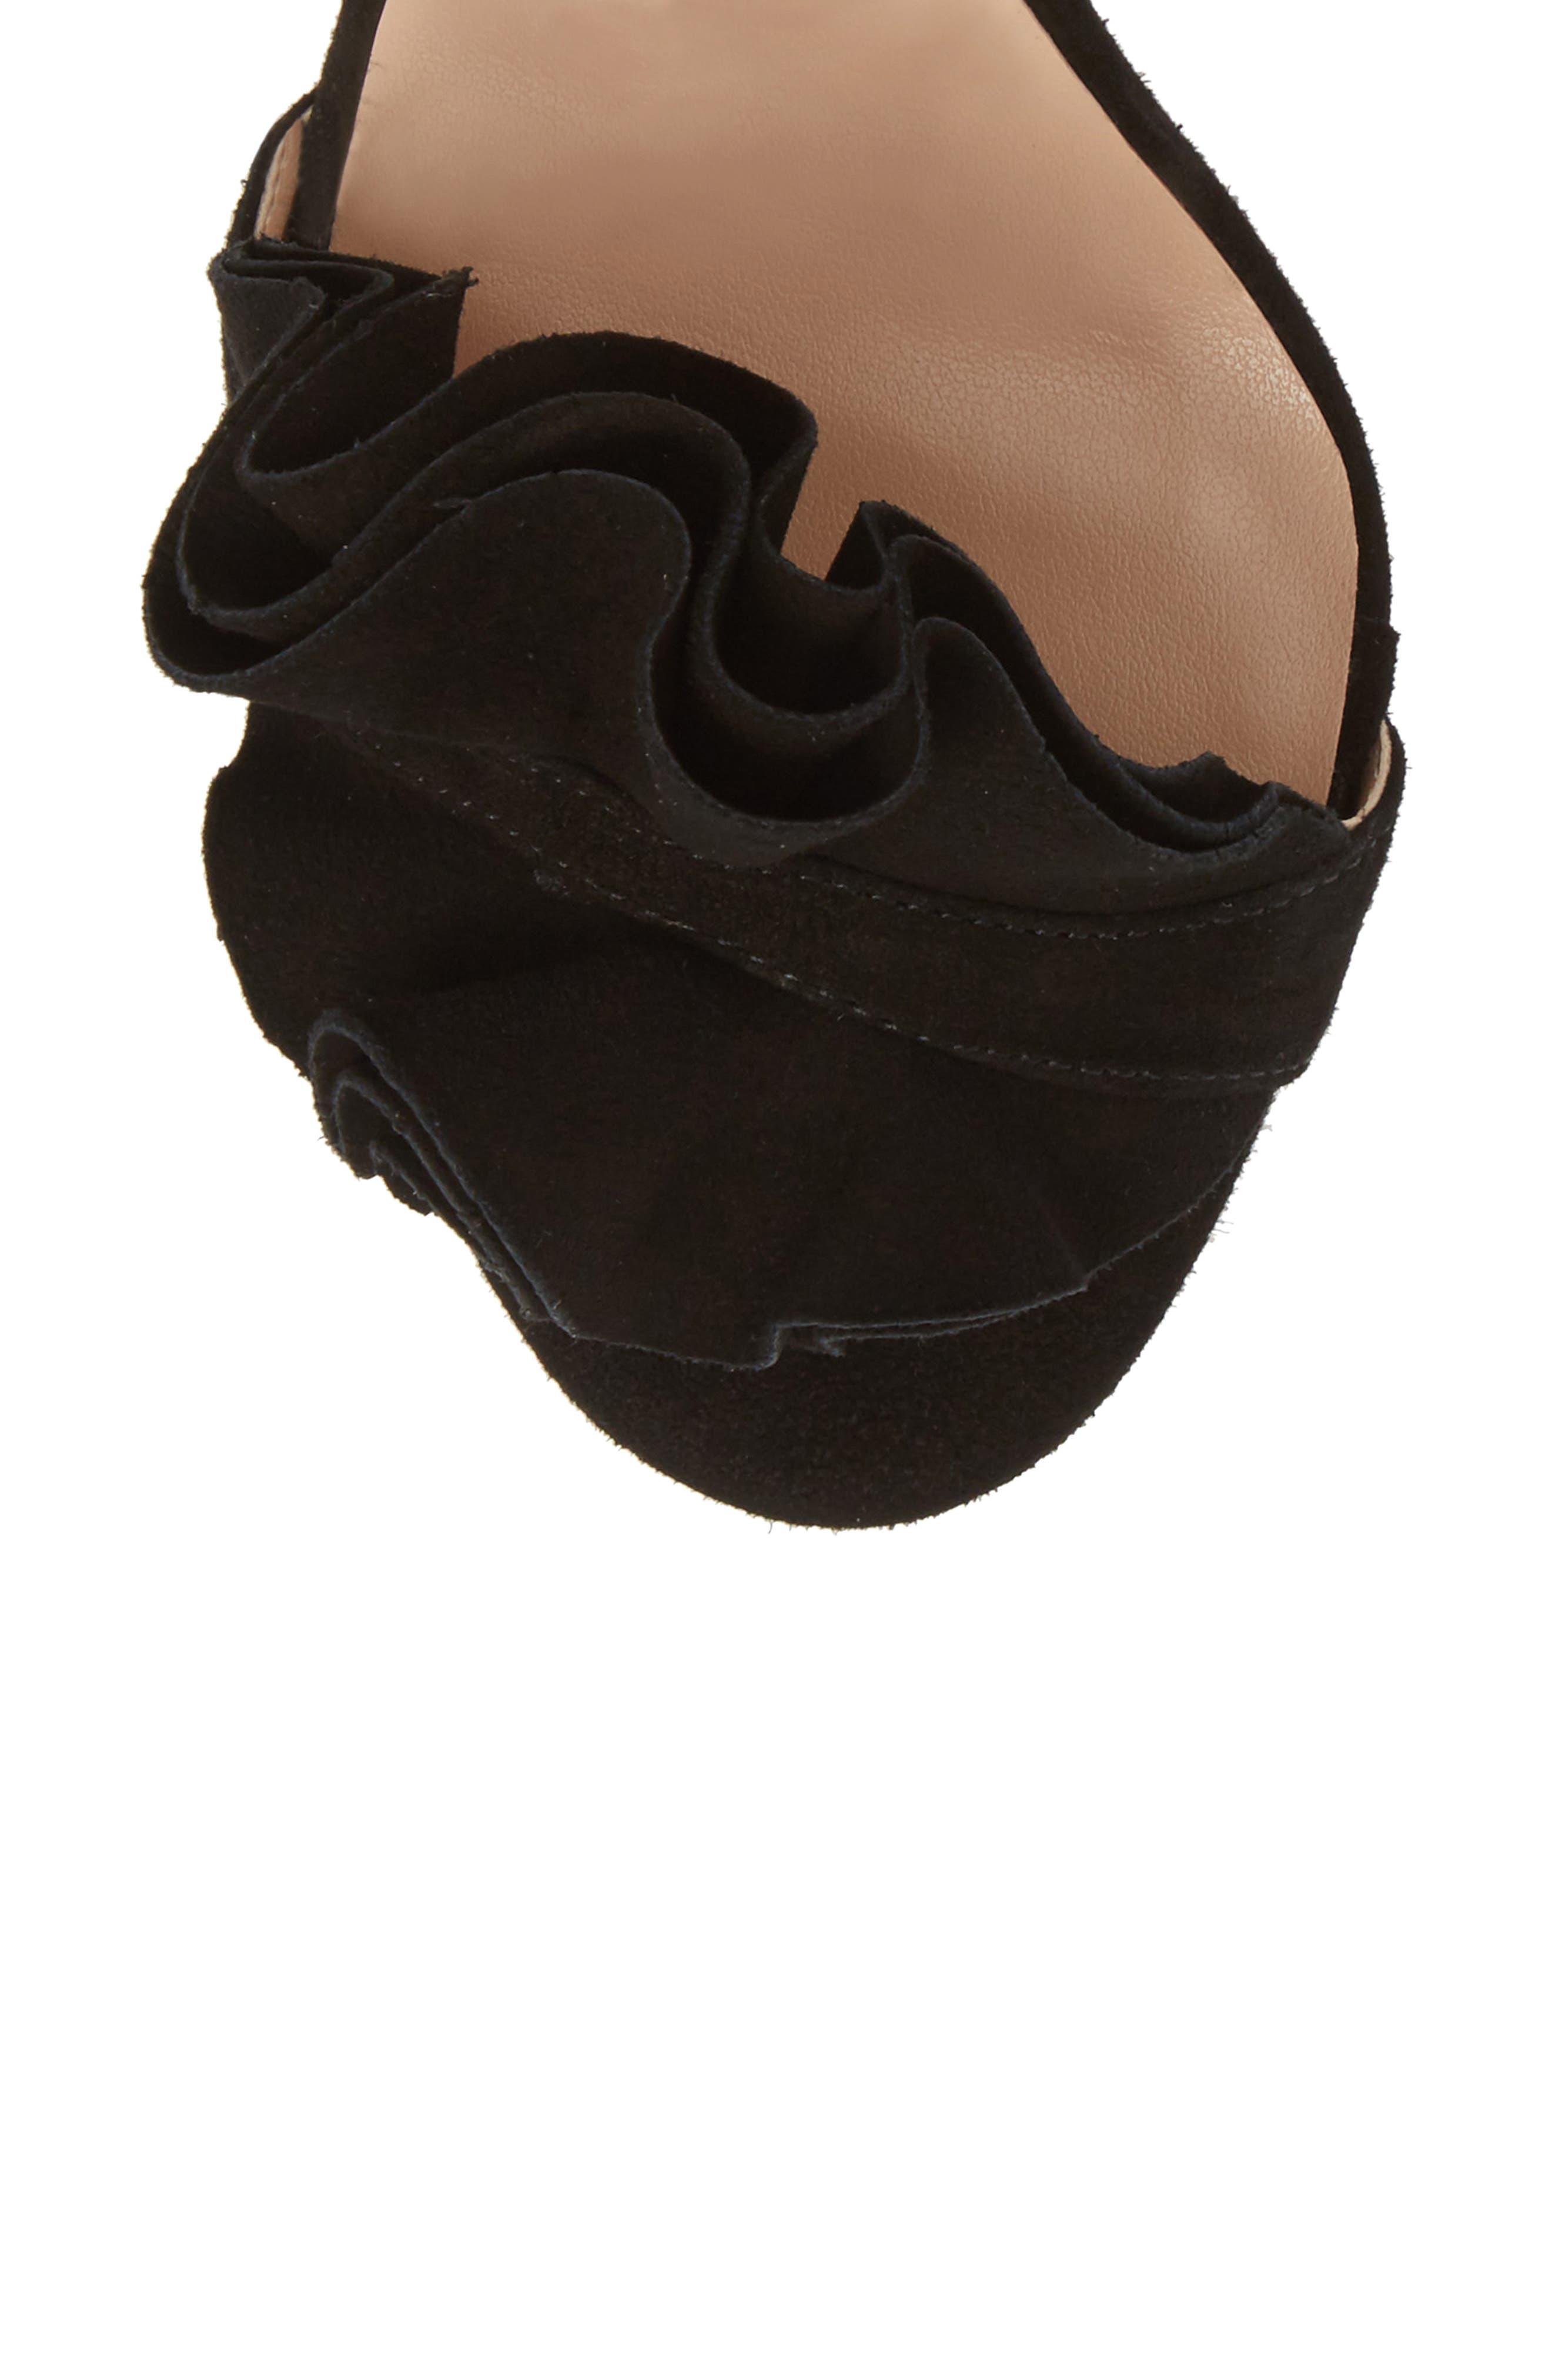 Kalipso Ruffled Wraparound Sandal,                             Alternate thumbnail 5, color,                             Black Suede